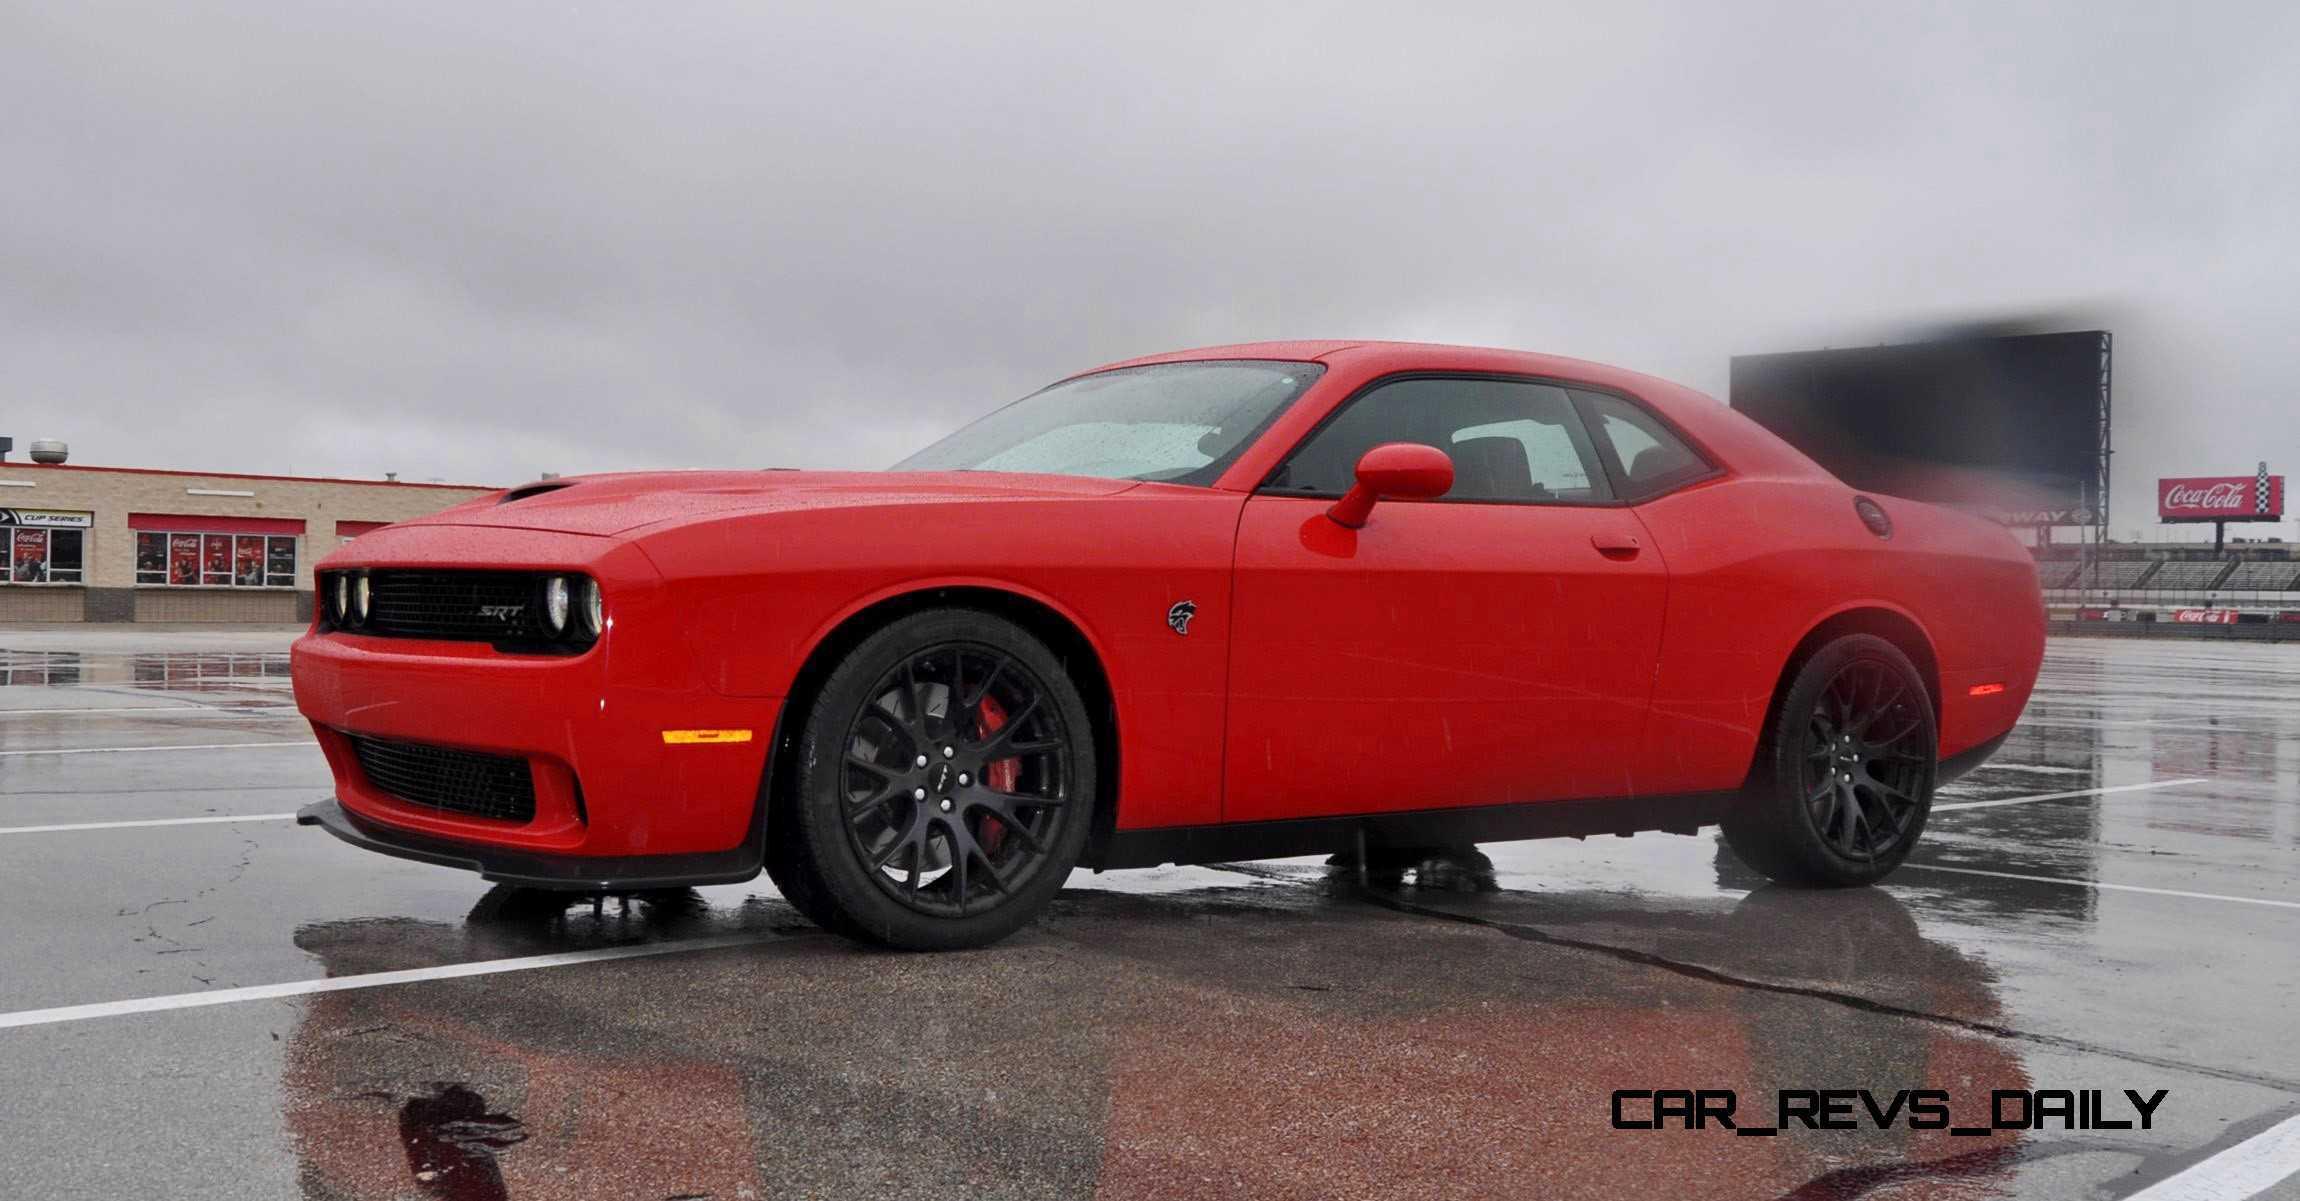 2015 Dodge Challenger SRT HELLCAT Photos 2015 Dodge Challenger Srt Hellcat